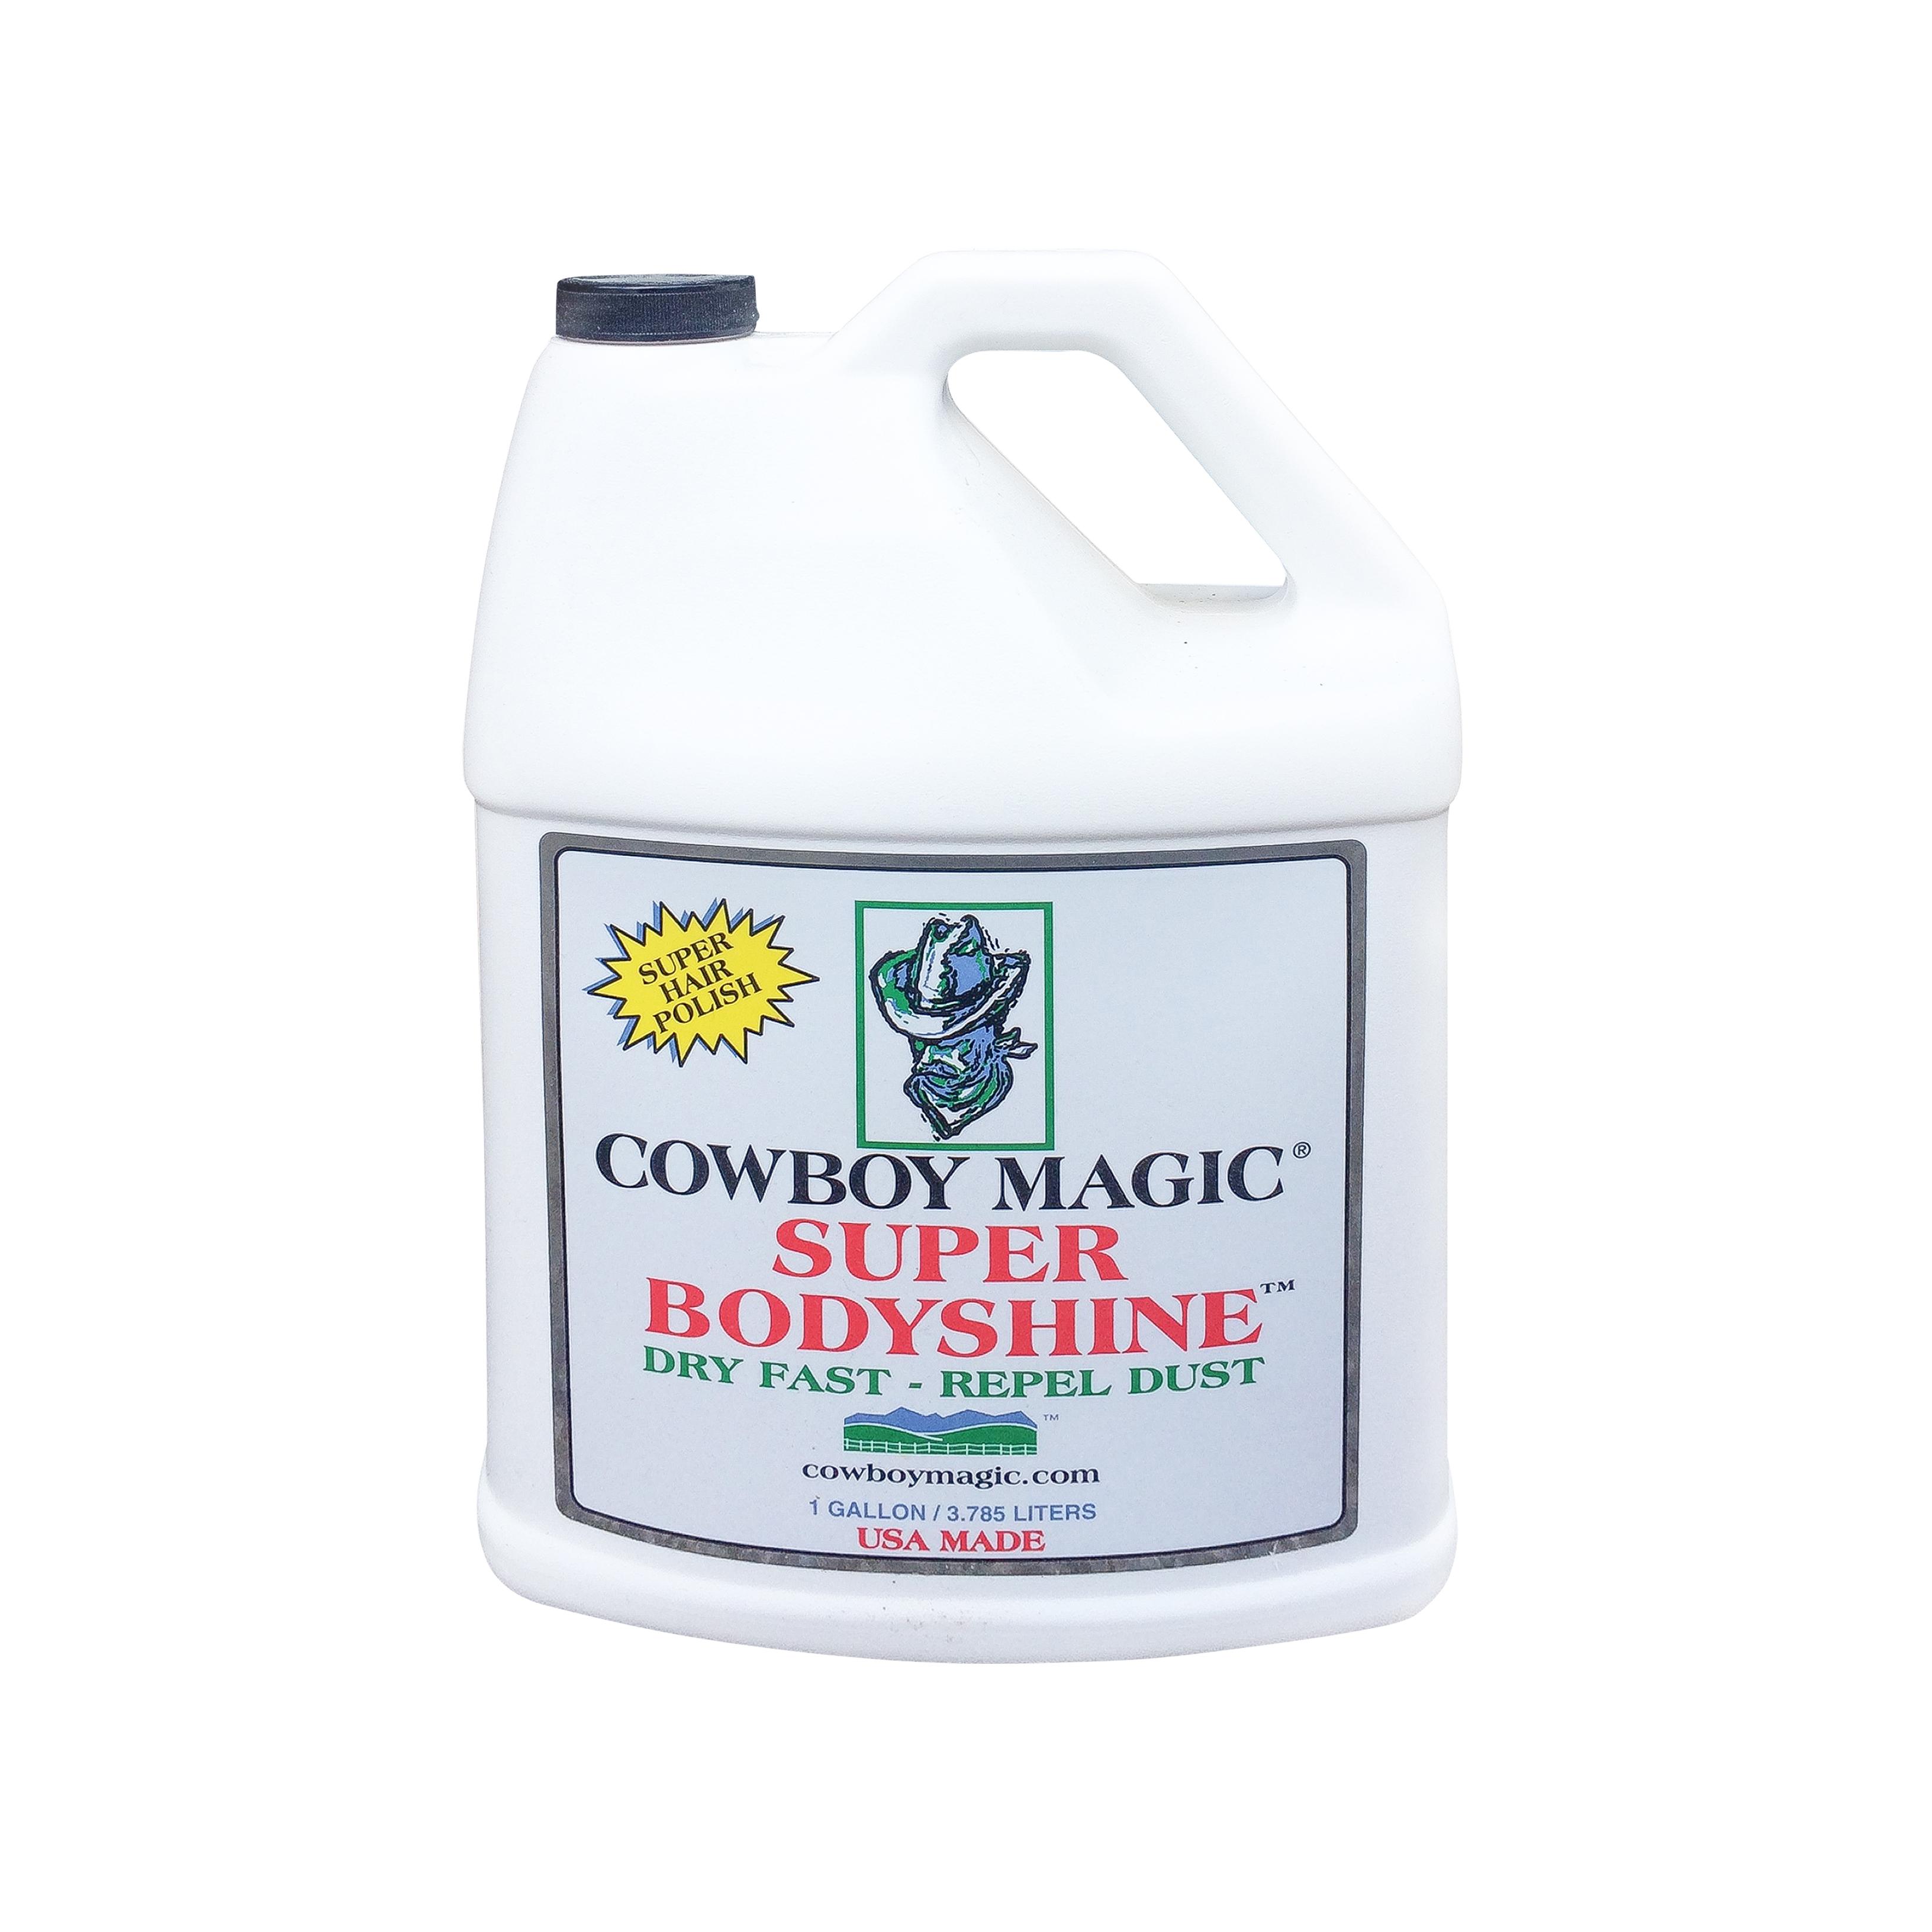 Cowboy Magic Super Bodyshine Gallon - Out Of Stock